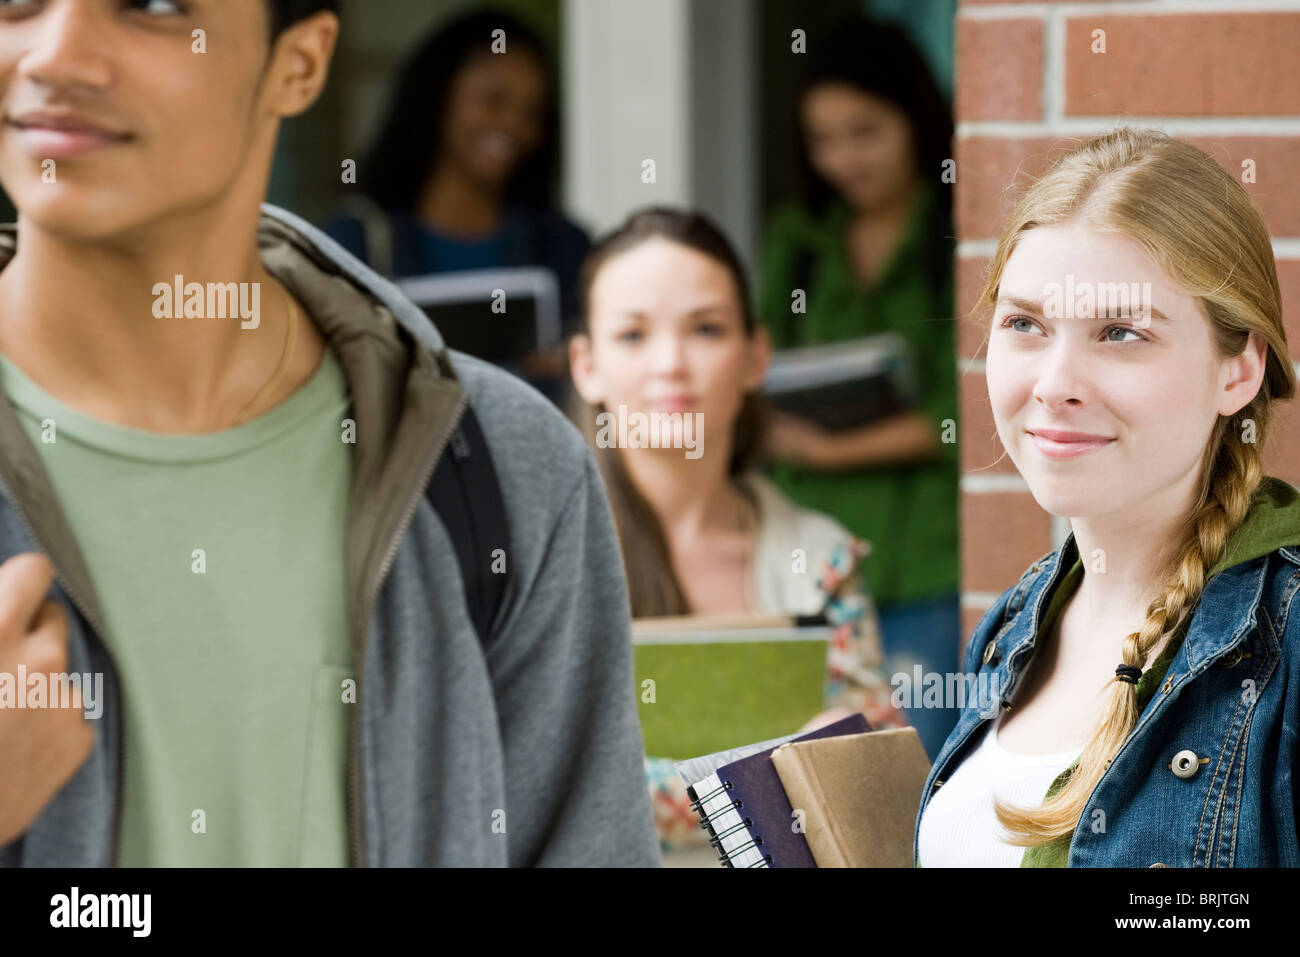 Junge Frau bewundernde Schüler vorbeigehen Stockbild